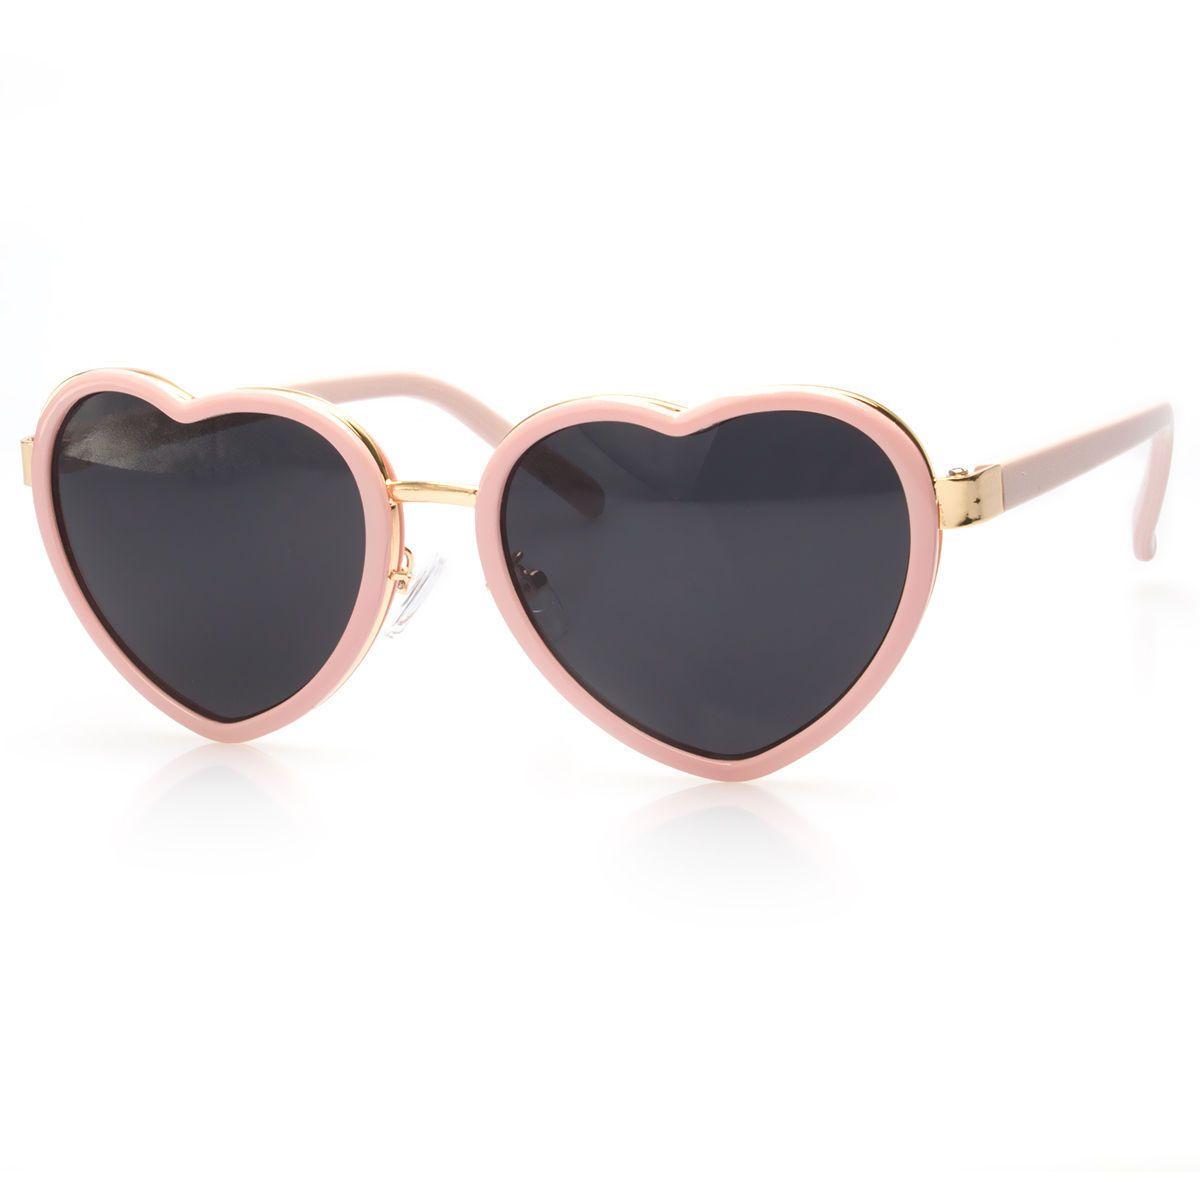 2c2aaa00fe Vintage Retro Fashion Lolita Heart Shaped Aviator Metal Frame Women  Sunglasses K